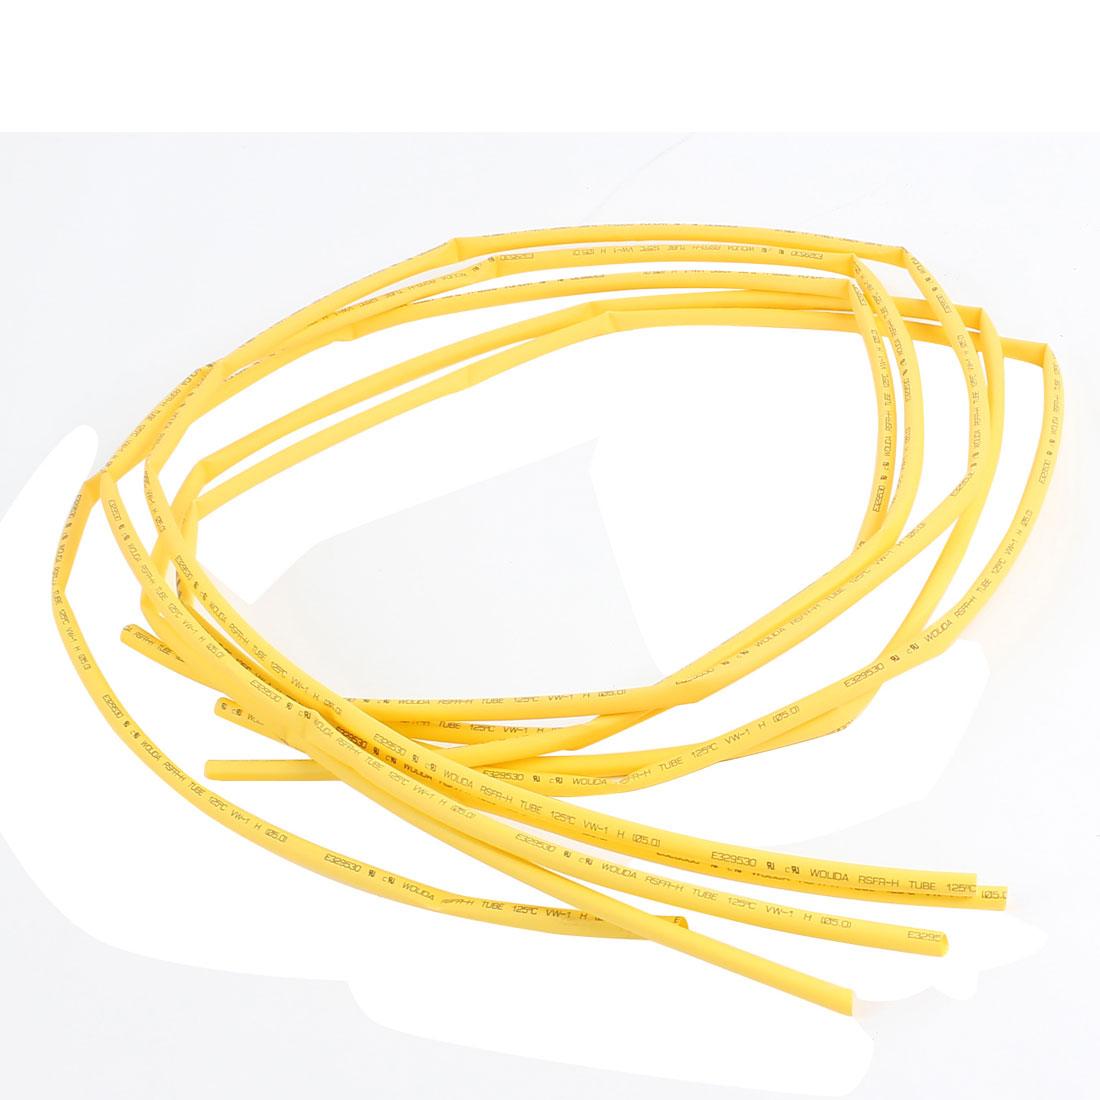 1M 5mm Dia Ratio 2:1 Heat Shrinking Shrinkable Tube Tubing Yellow 5 Pcs